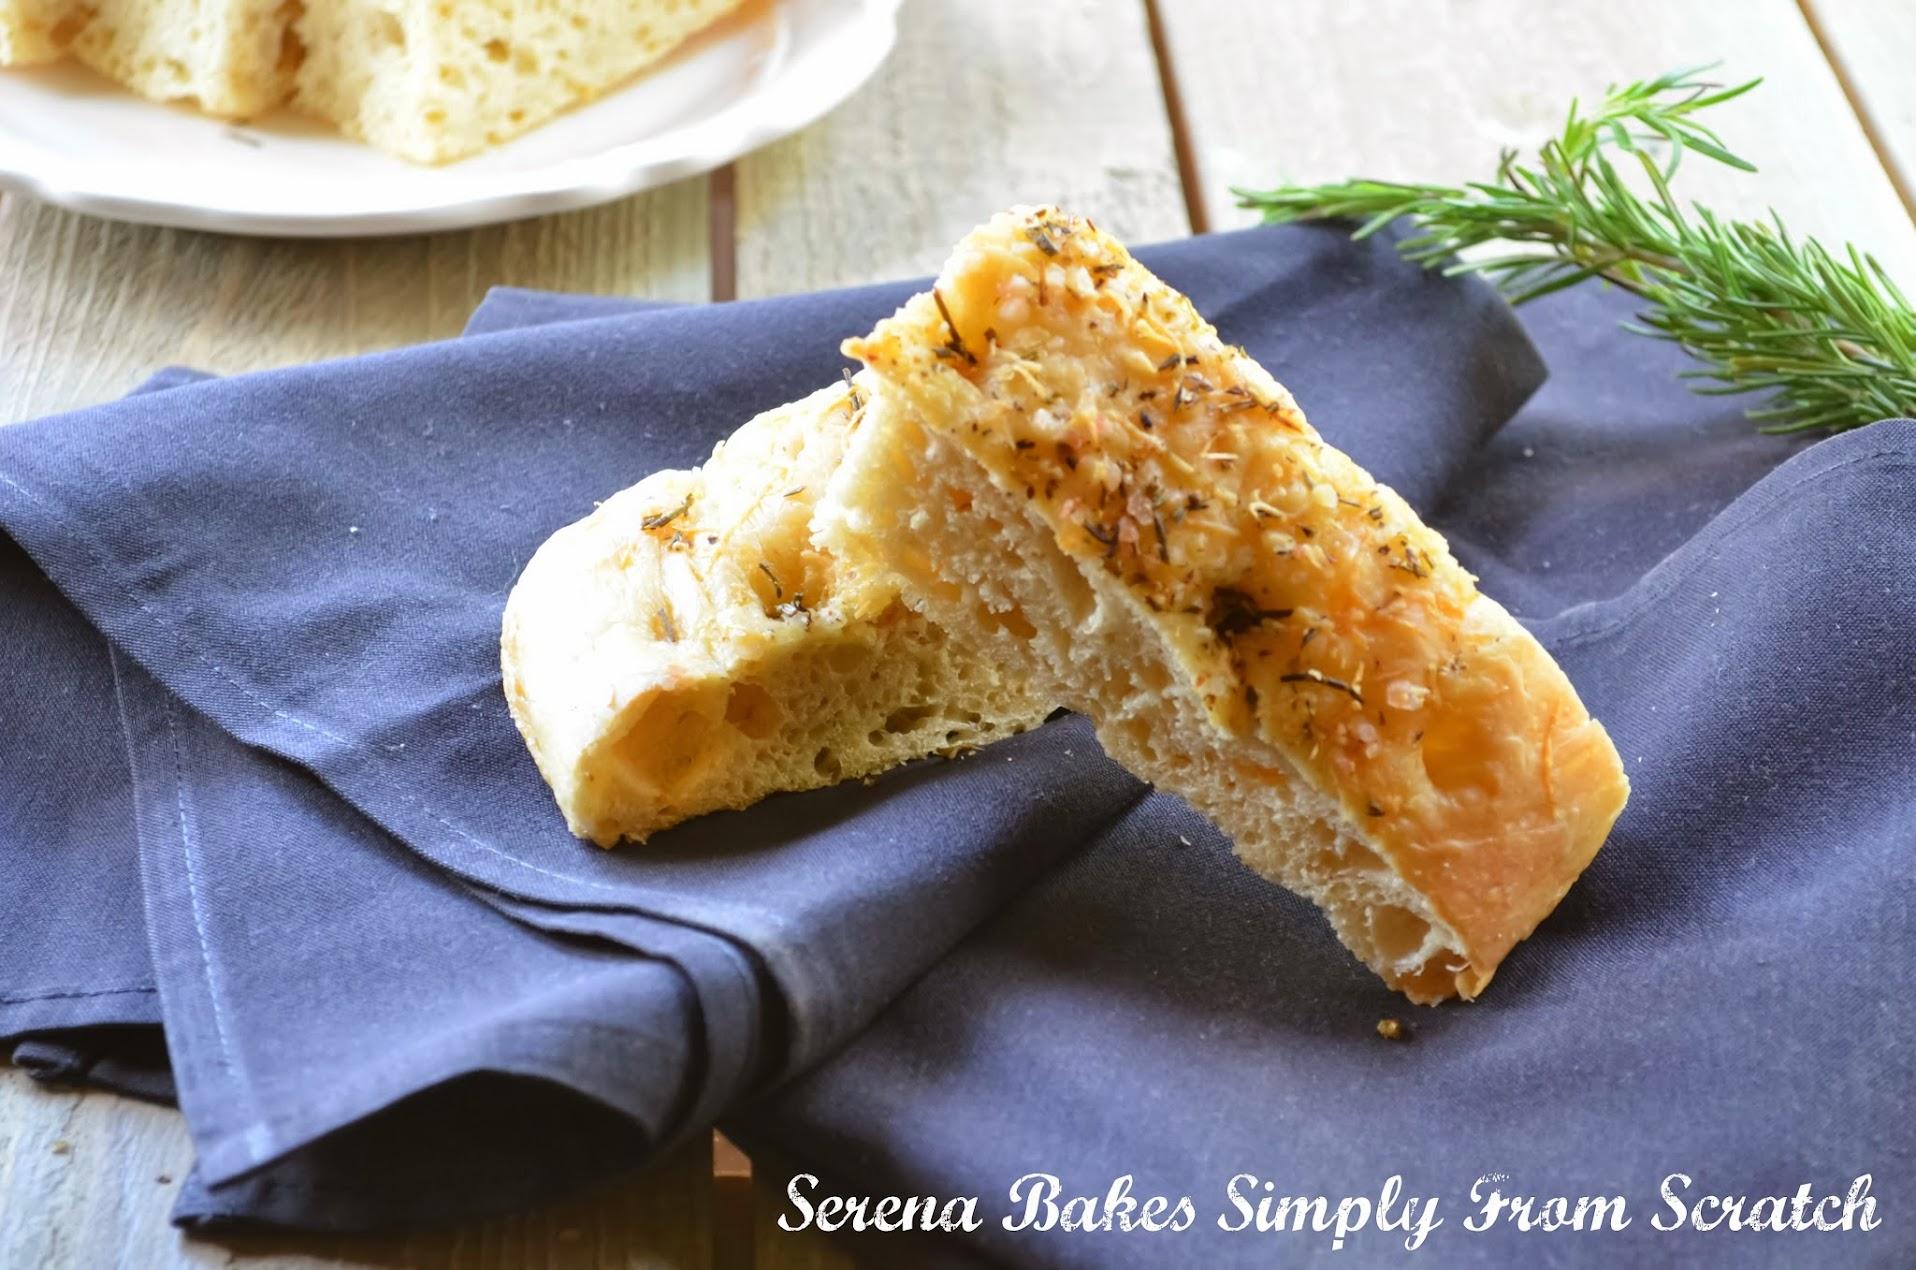 Herbed-Focaccia-Bread-Serving.jpg